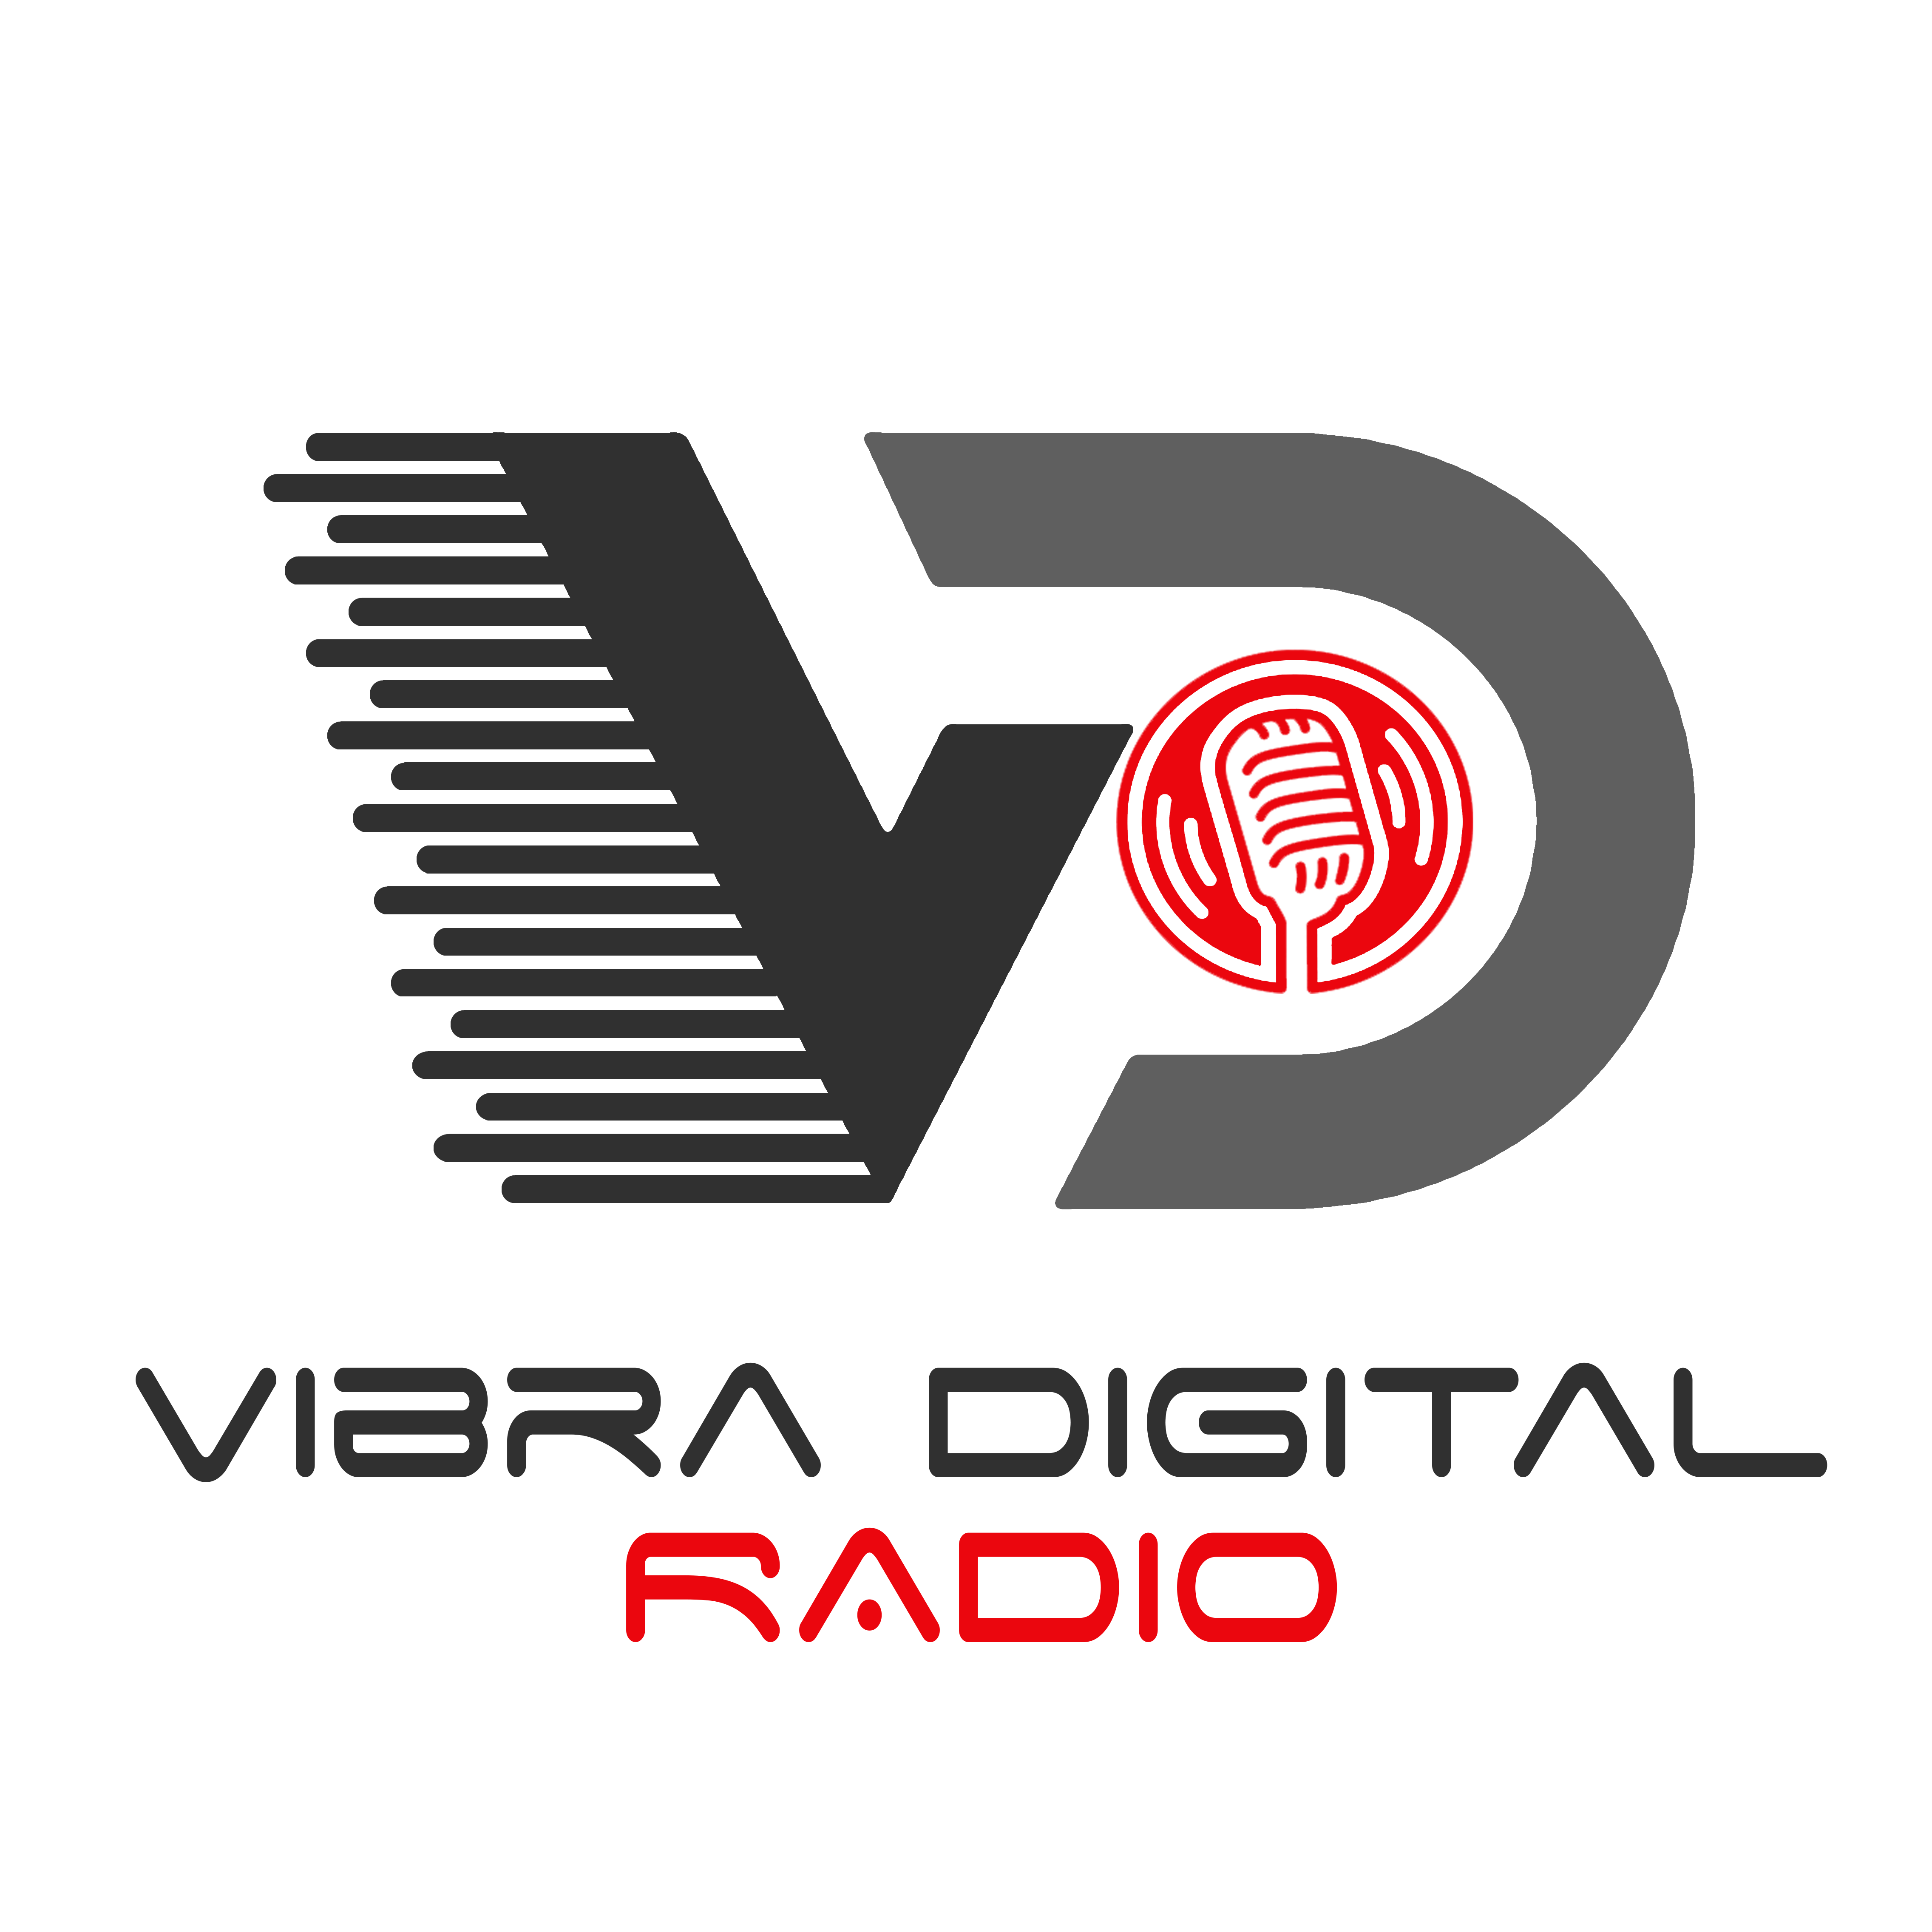 Vibra Digital Radio